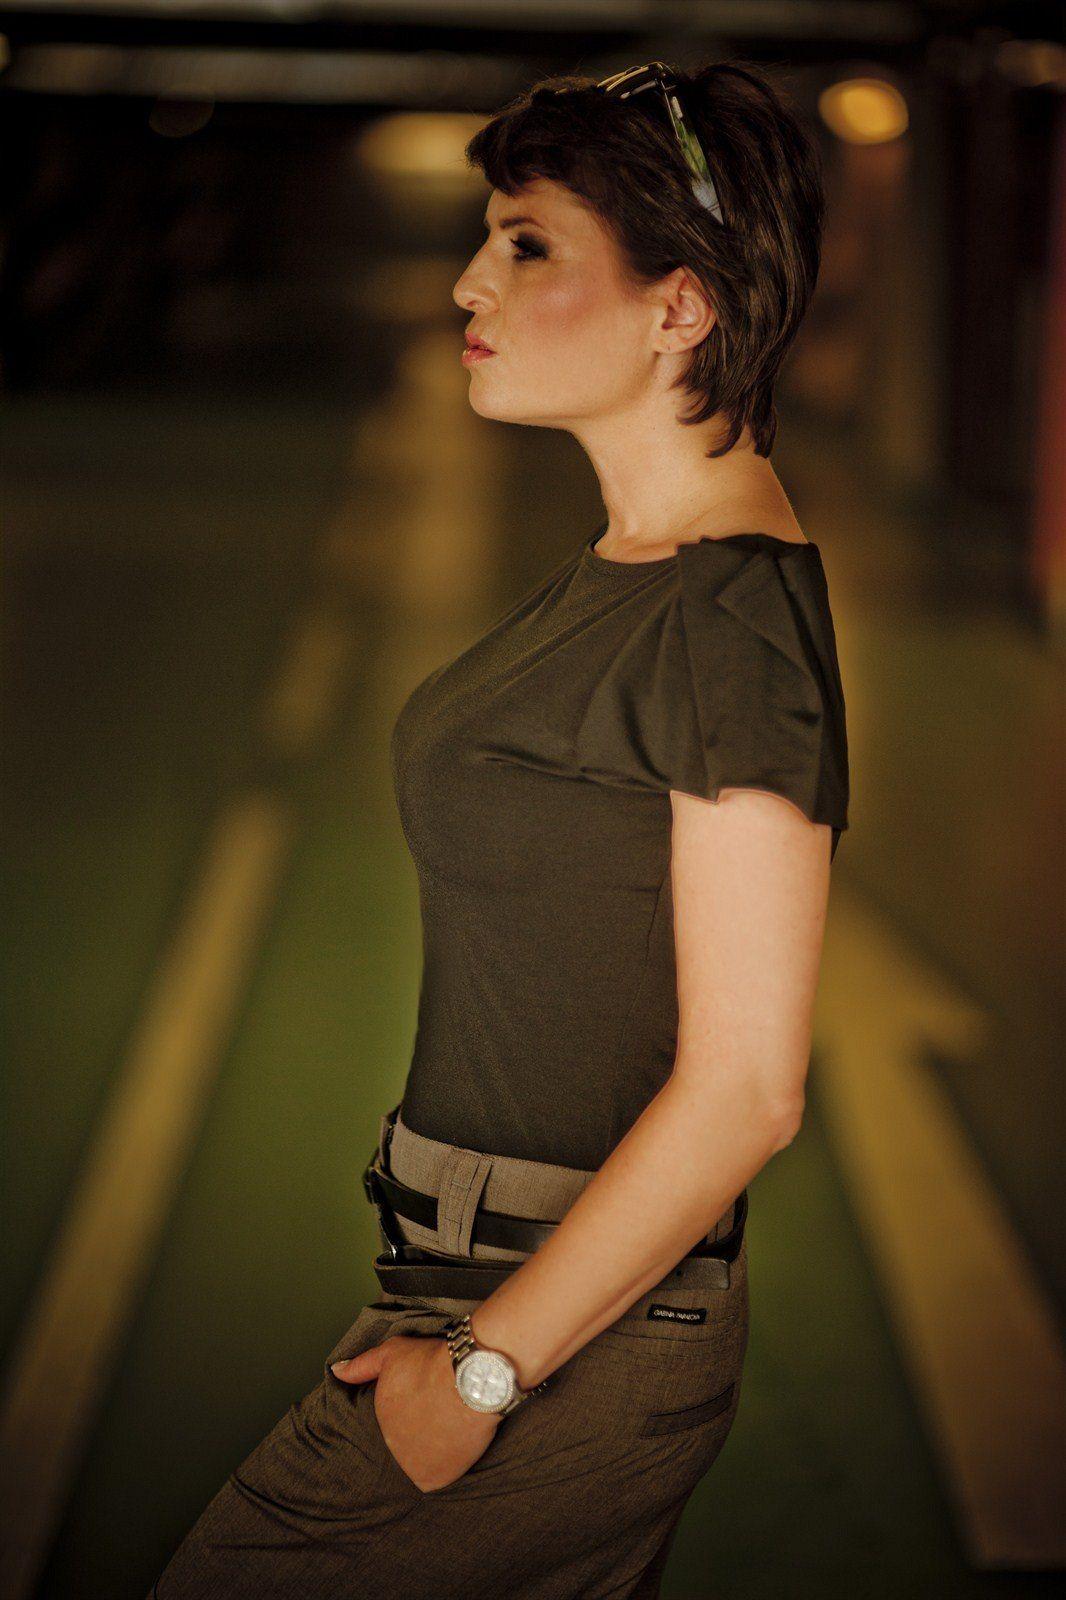 Ana Villafane,Phyllis Fraser Erotic pics & movies JJ Feild (born 1978 (born in Boulder, Colorado, United States (British-American actor),Annabelle Apsion